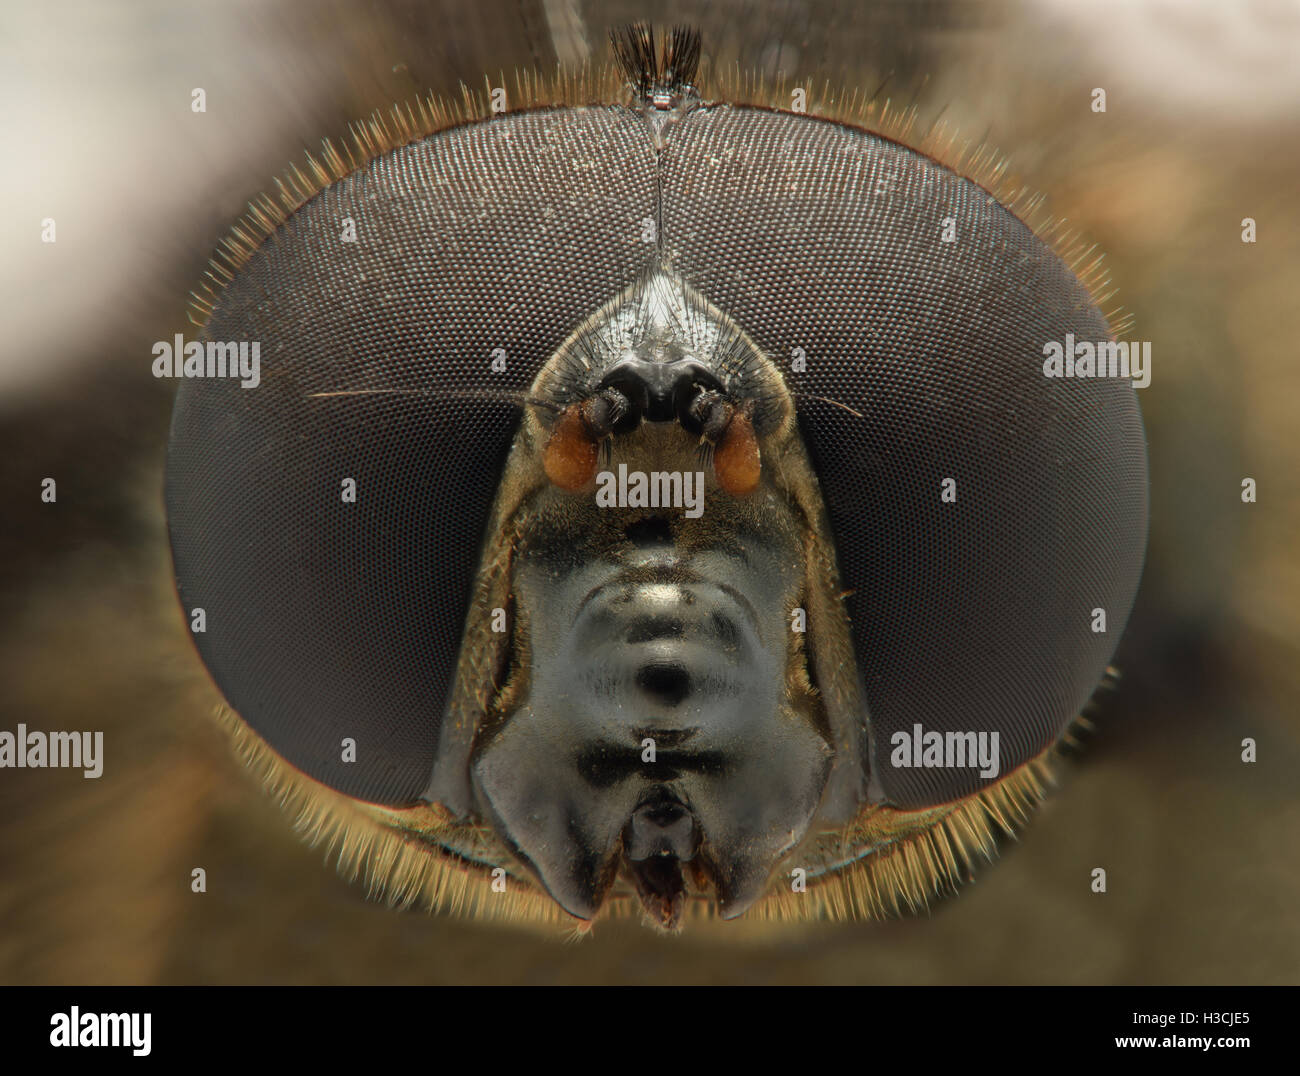 Ampliación extrema - volar imitando bee Foto de stock